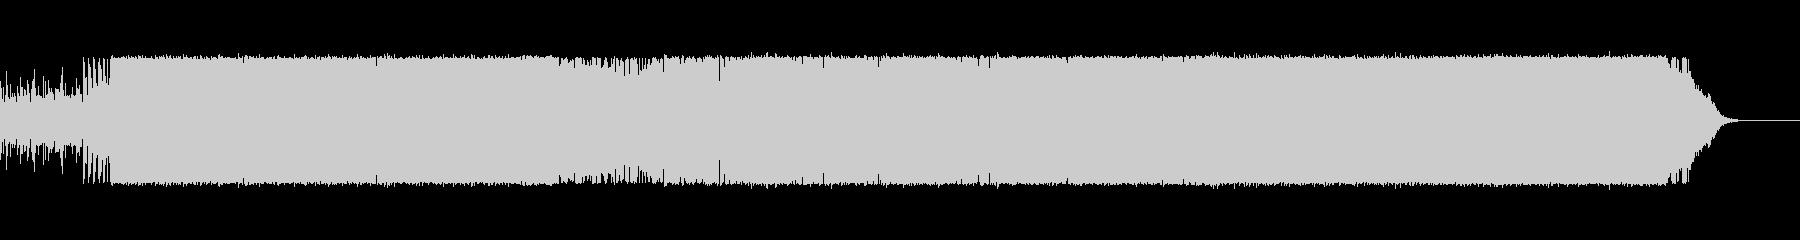 bpm121の重厚感のあるテクノの未再生の波形